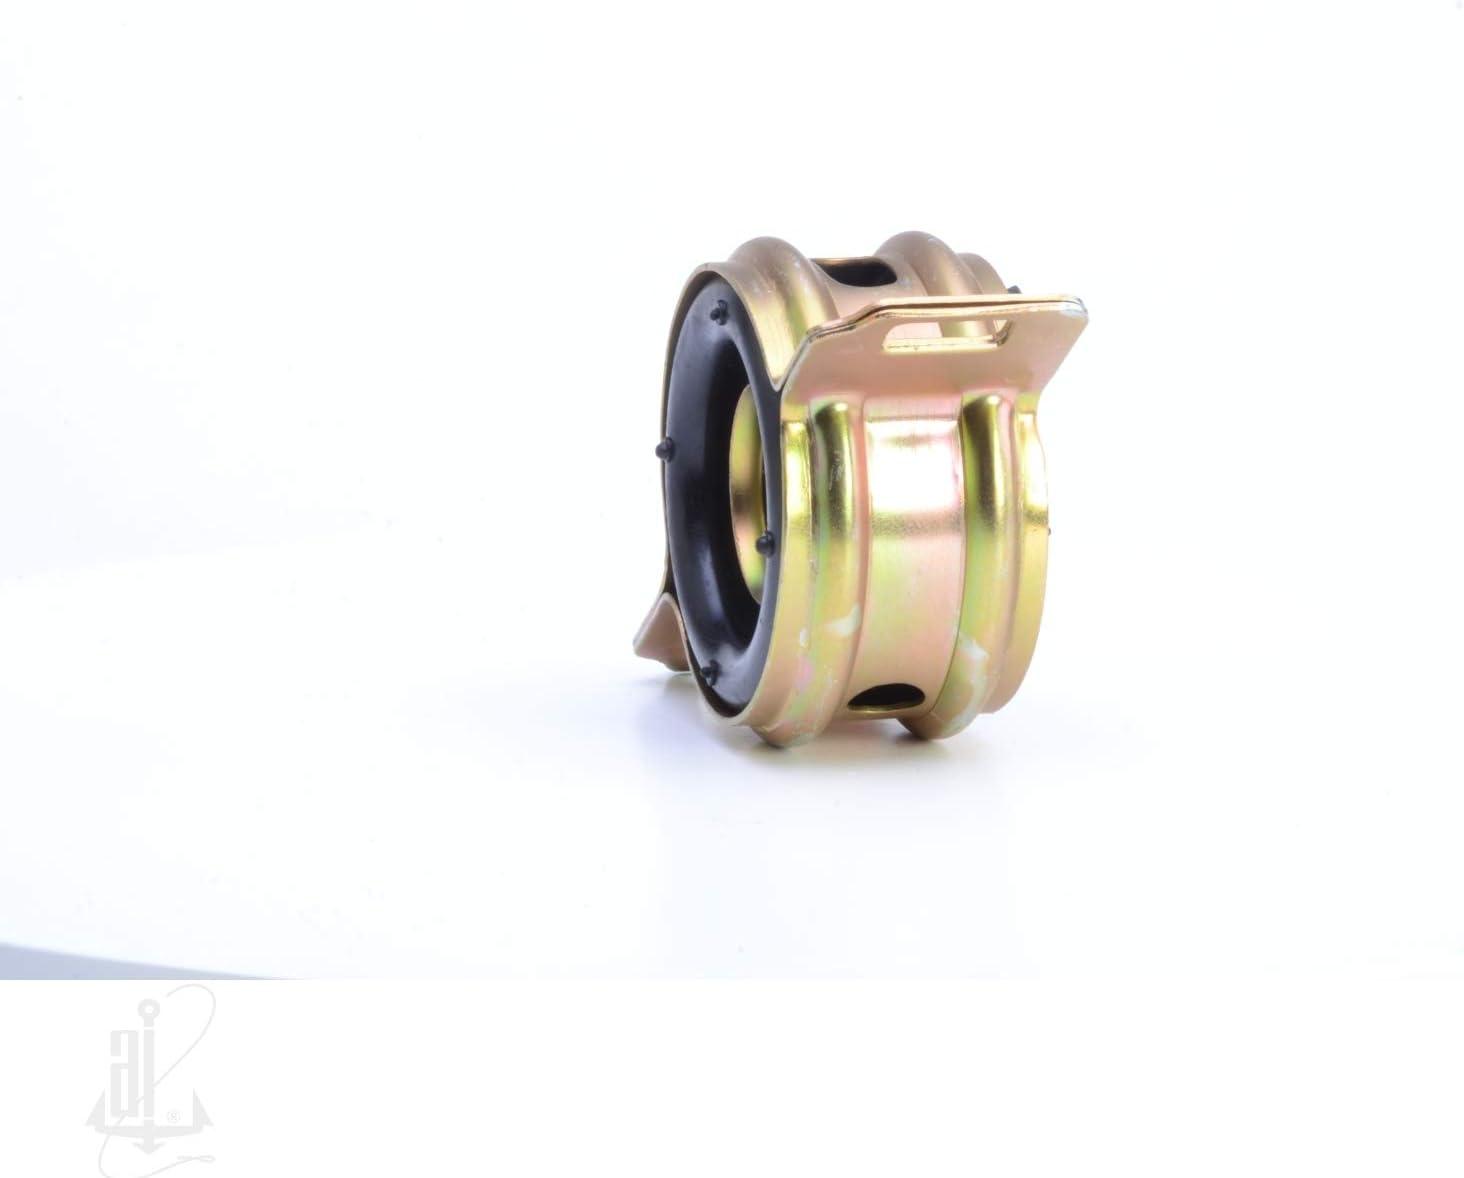 D/&D PowerDrive 200365 Norge Appliance Replacement Belt 46 Length A//4L Belt Cross Section Rubber